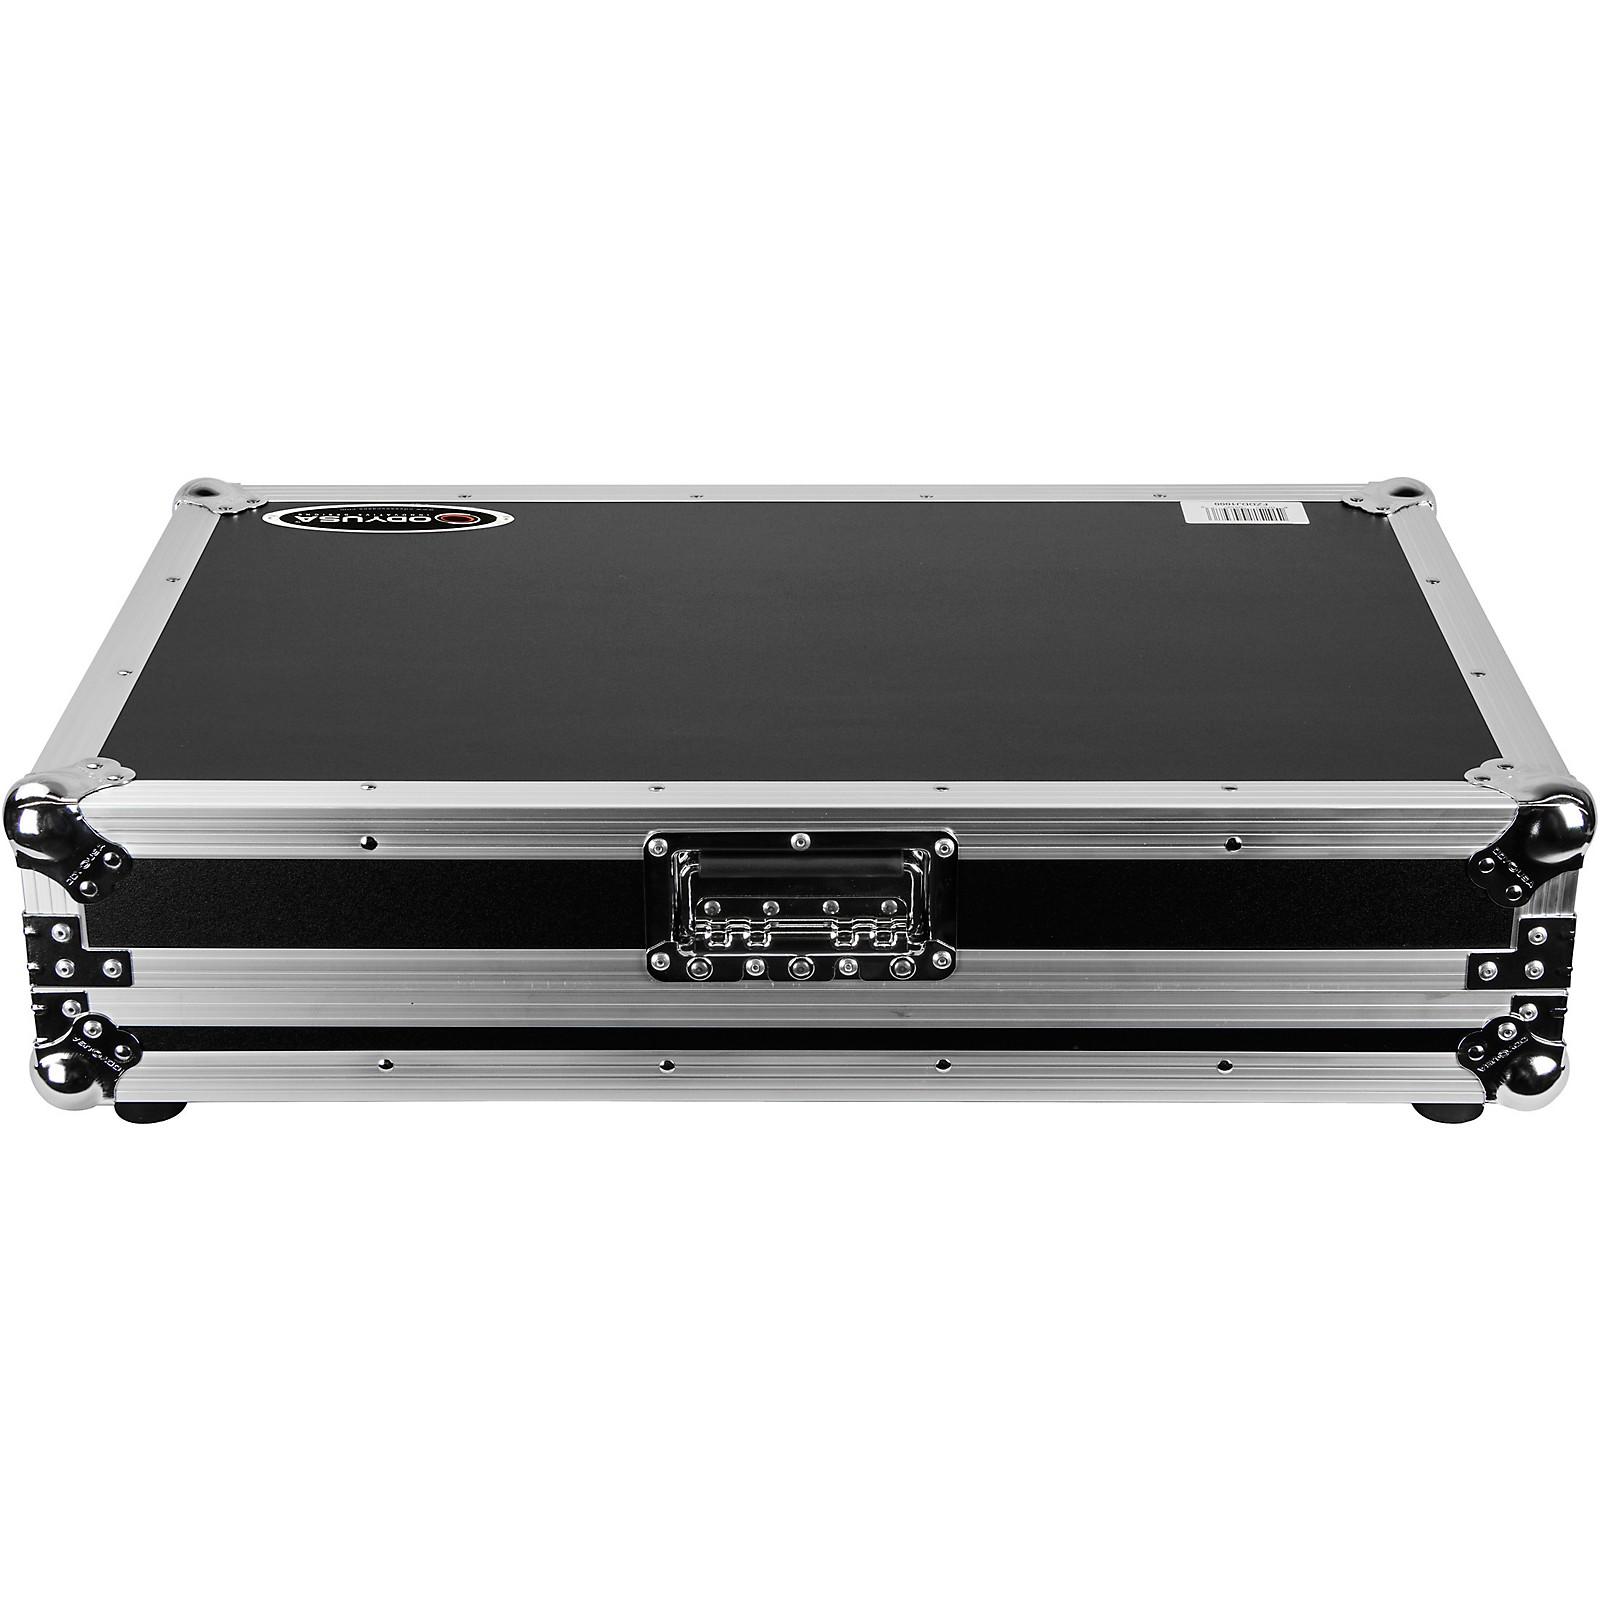 Odyssey FZDDJ1000 Flight Zone Low Profile Series Pioneer DDJ-1000 DJ Controller Case